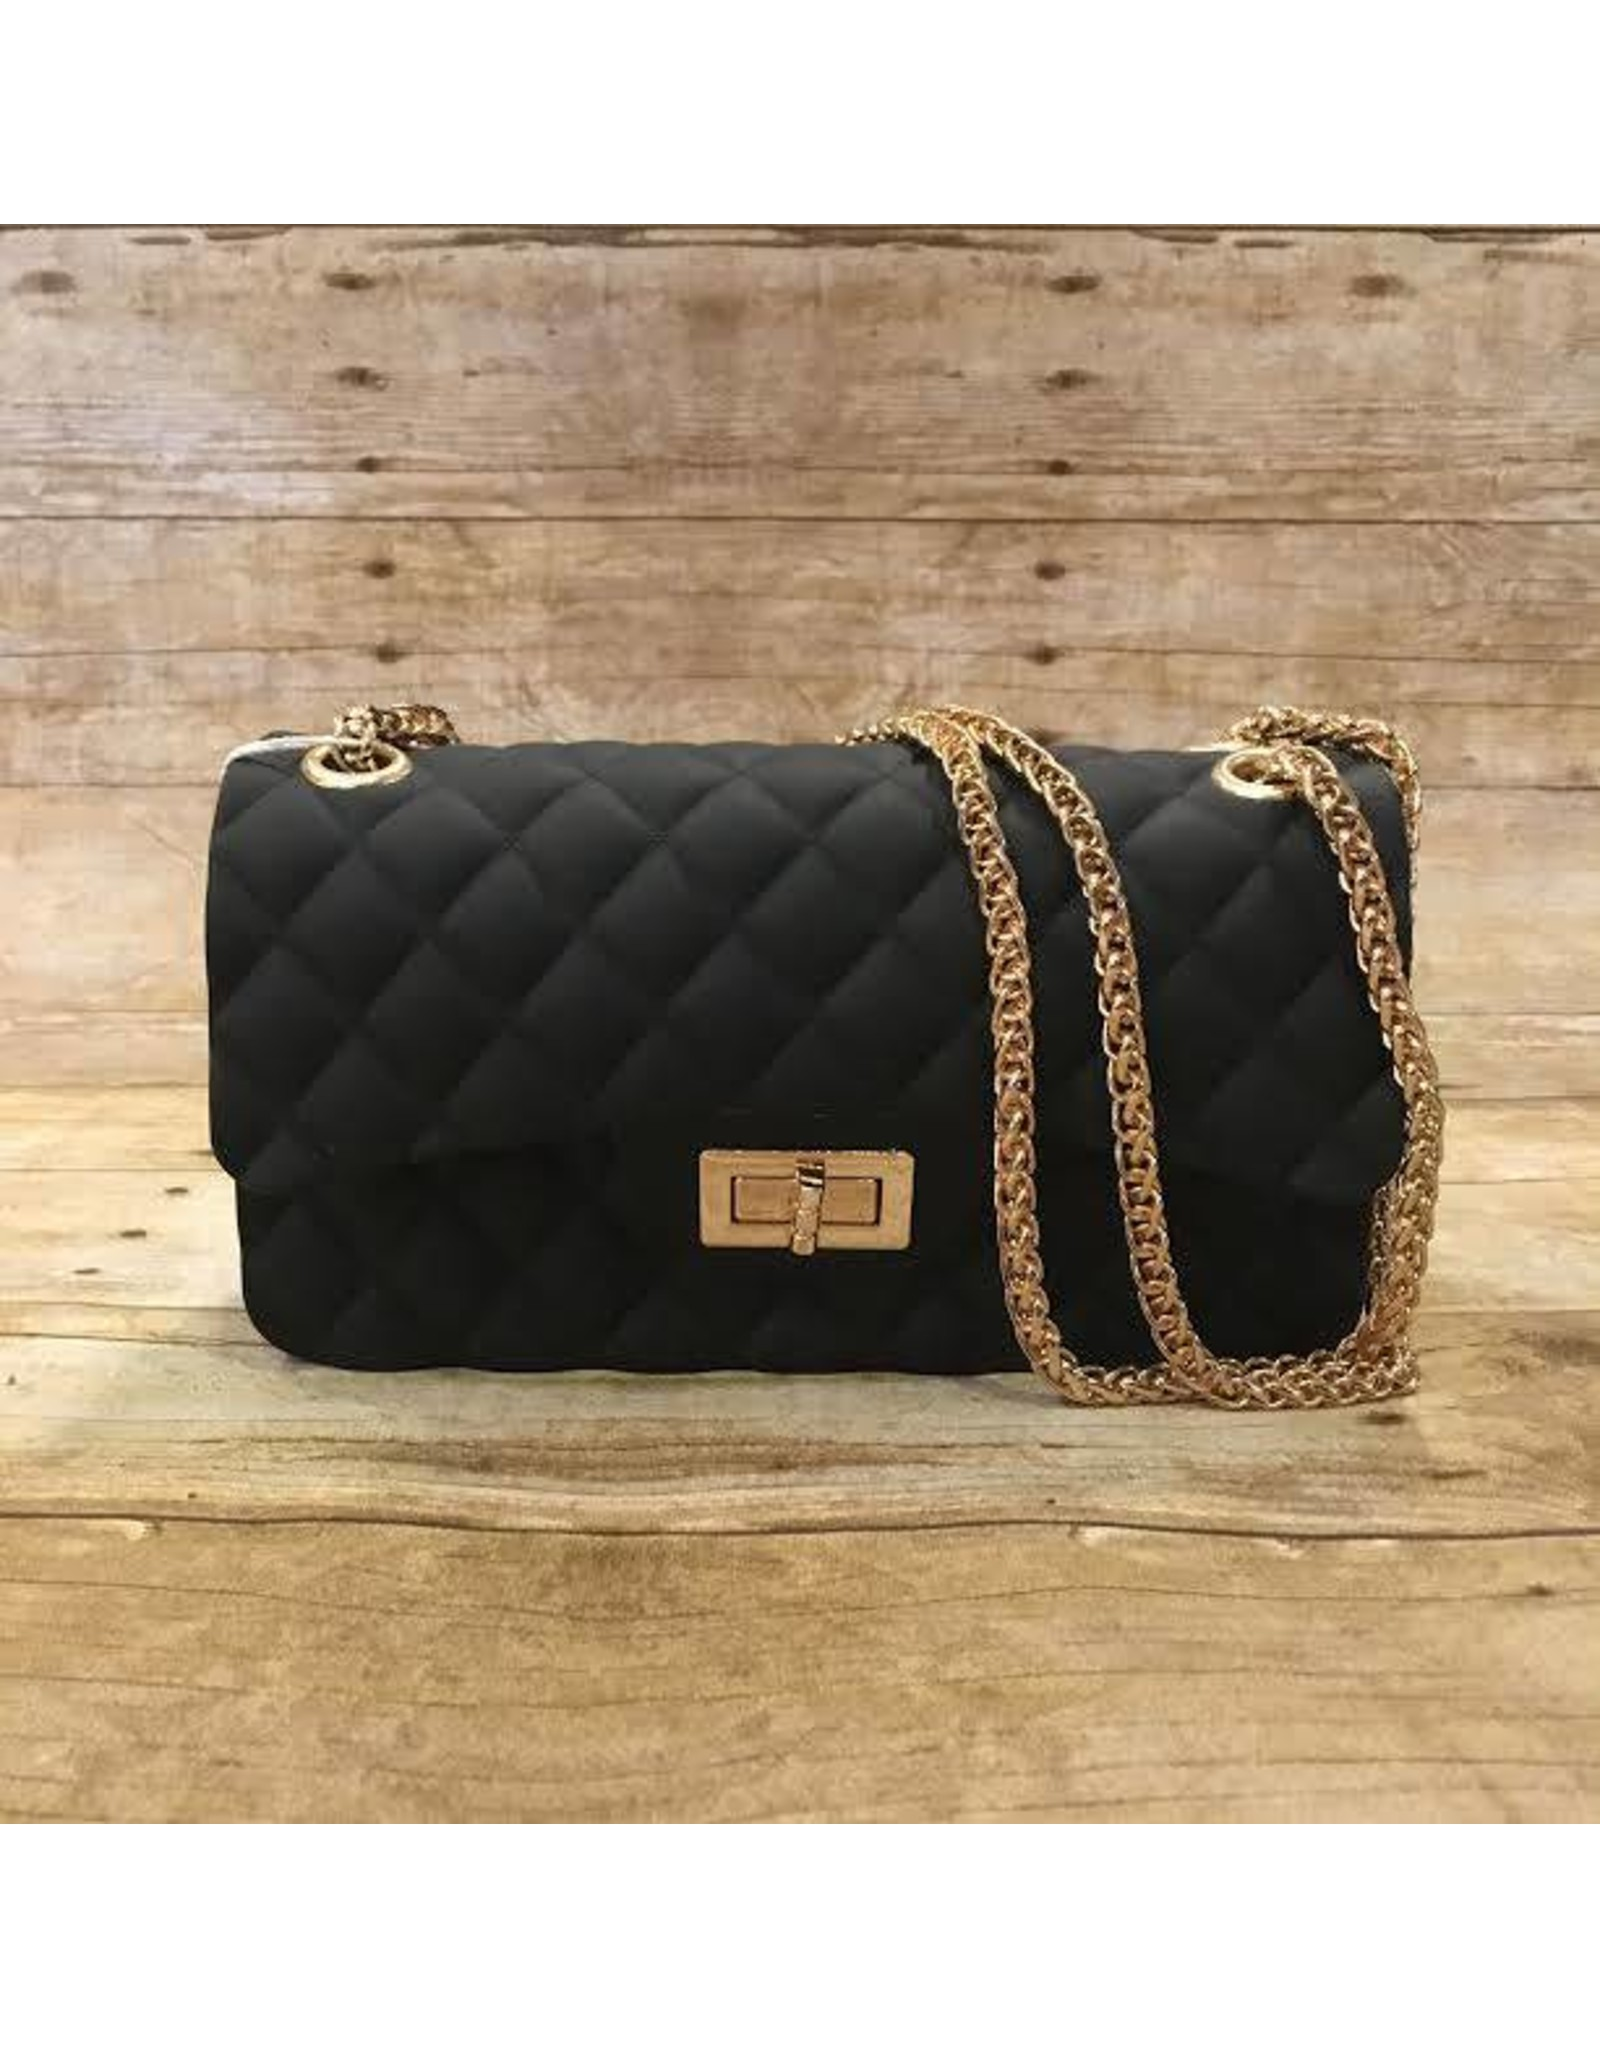 Small Gold Chain Handbag